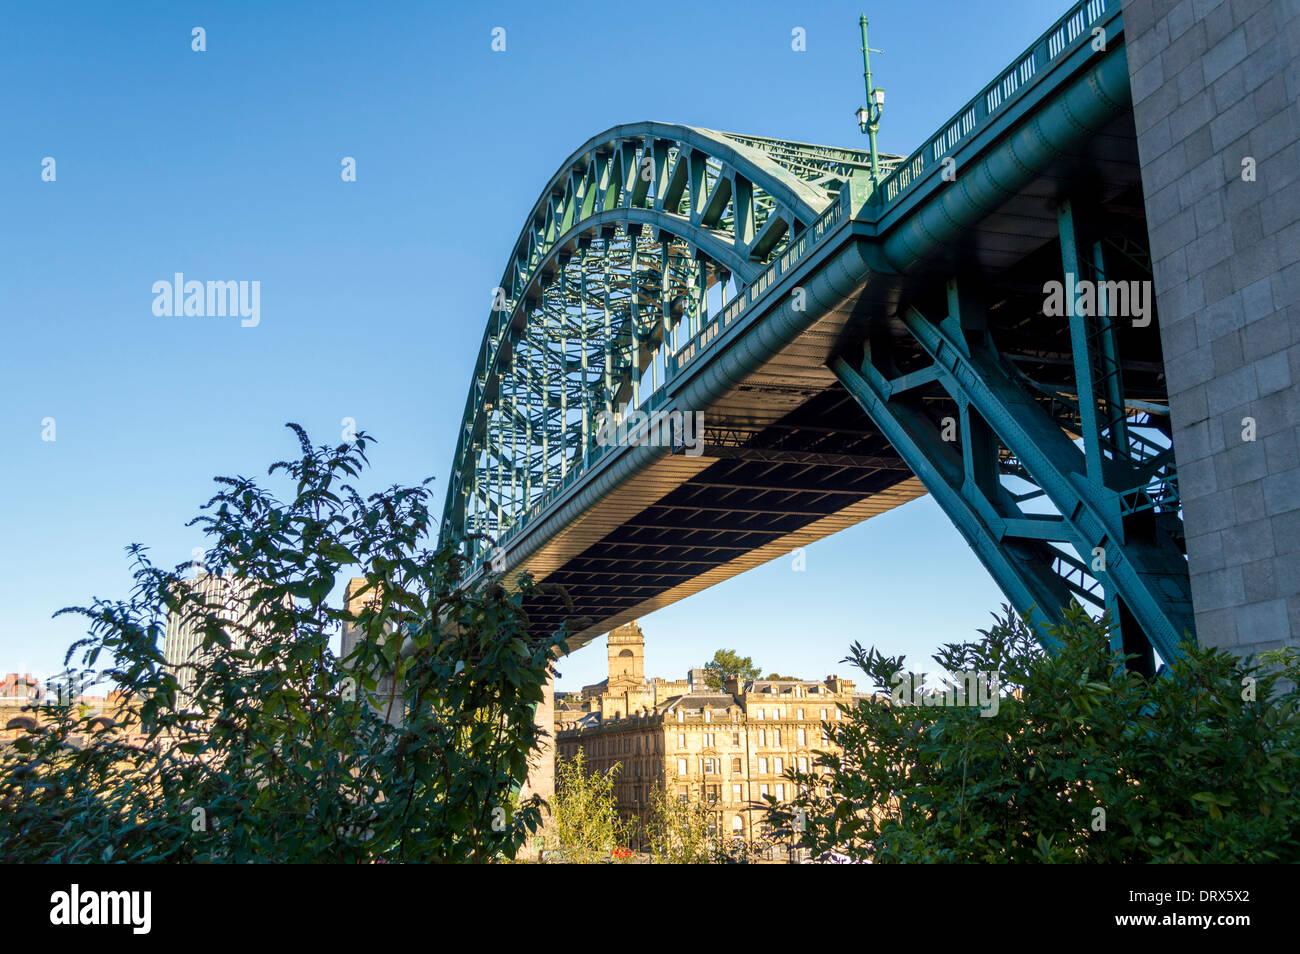 Tyne Bridge spanning el río Tyne a unirse a Gateshead y Newcastle, Reino Unido. Foto de stock